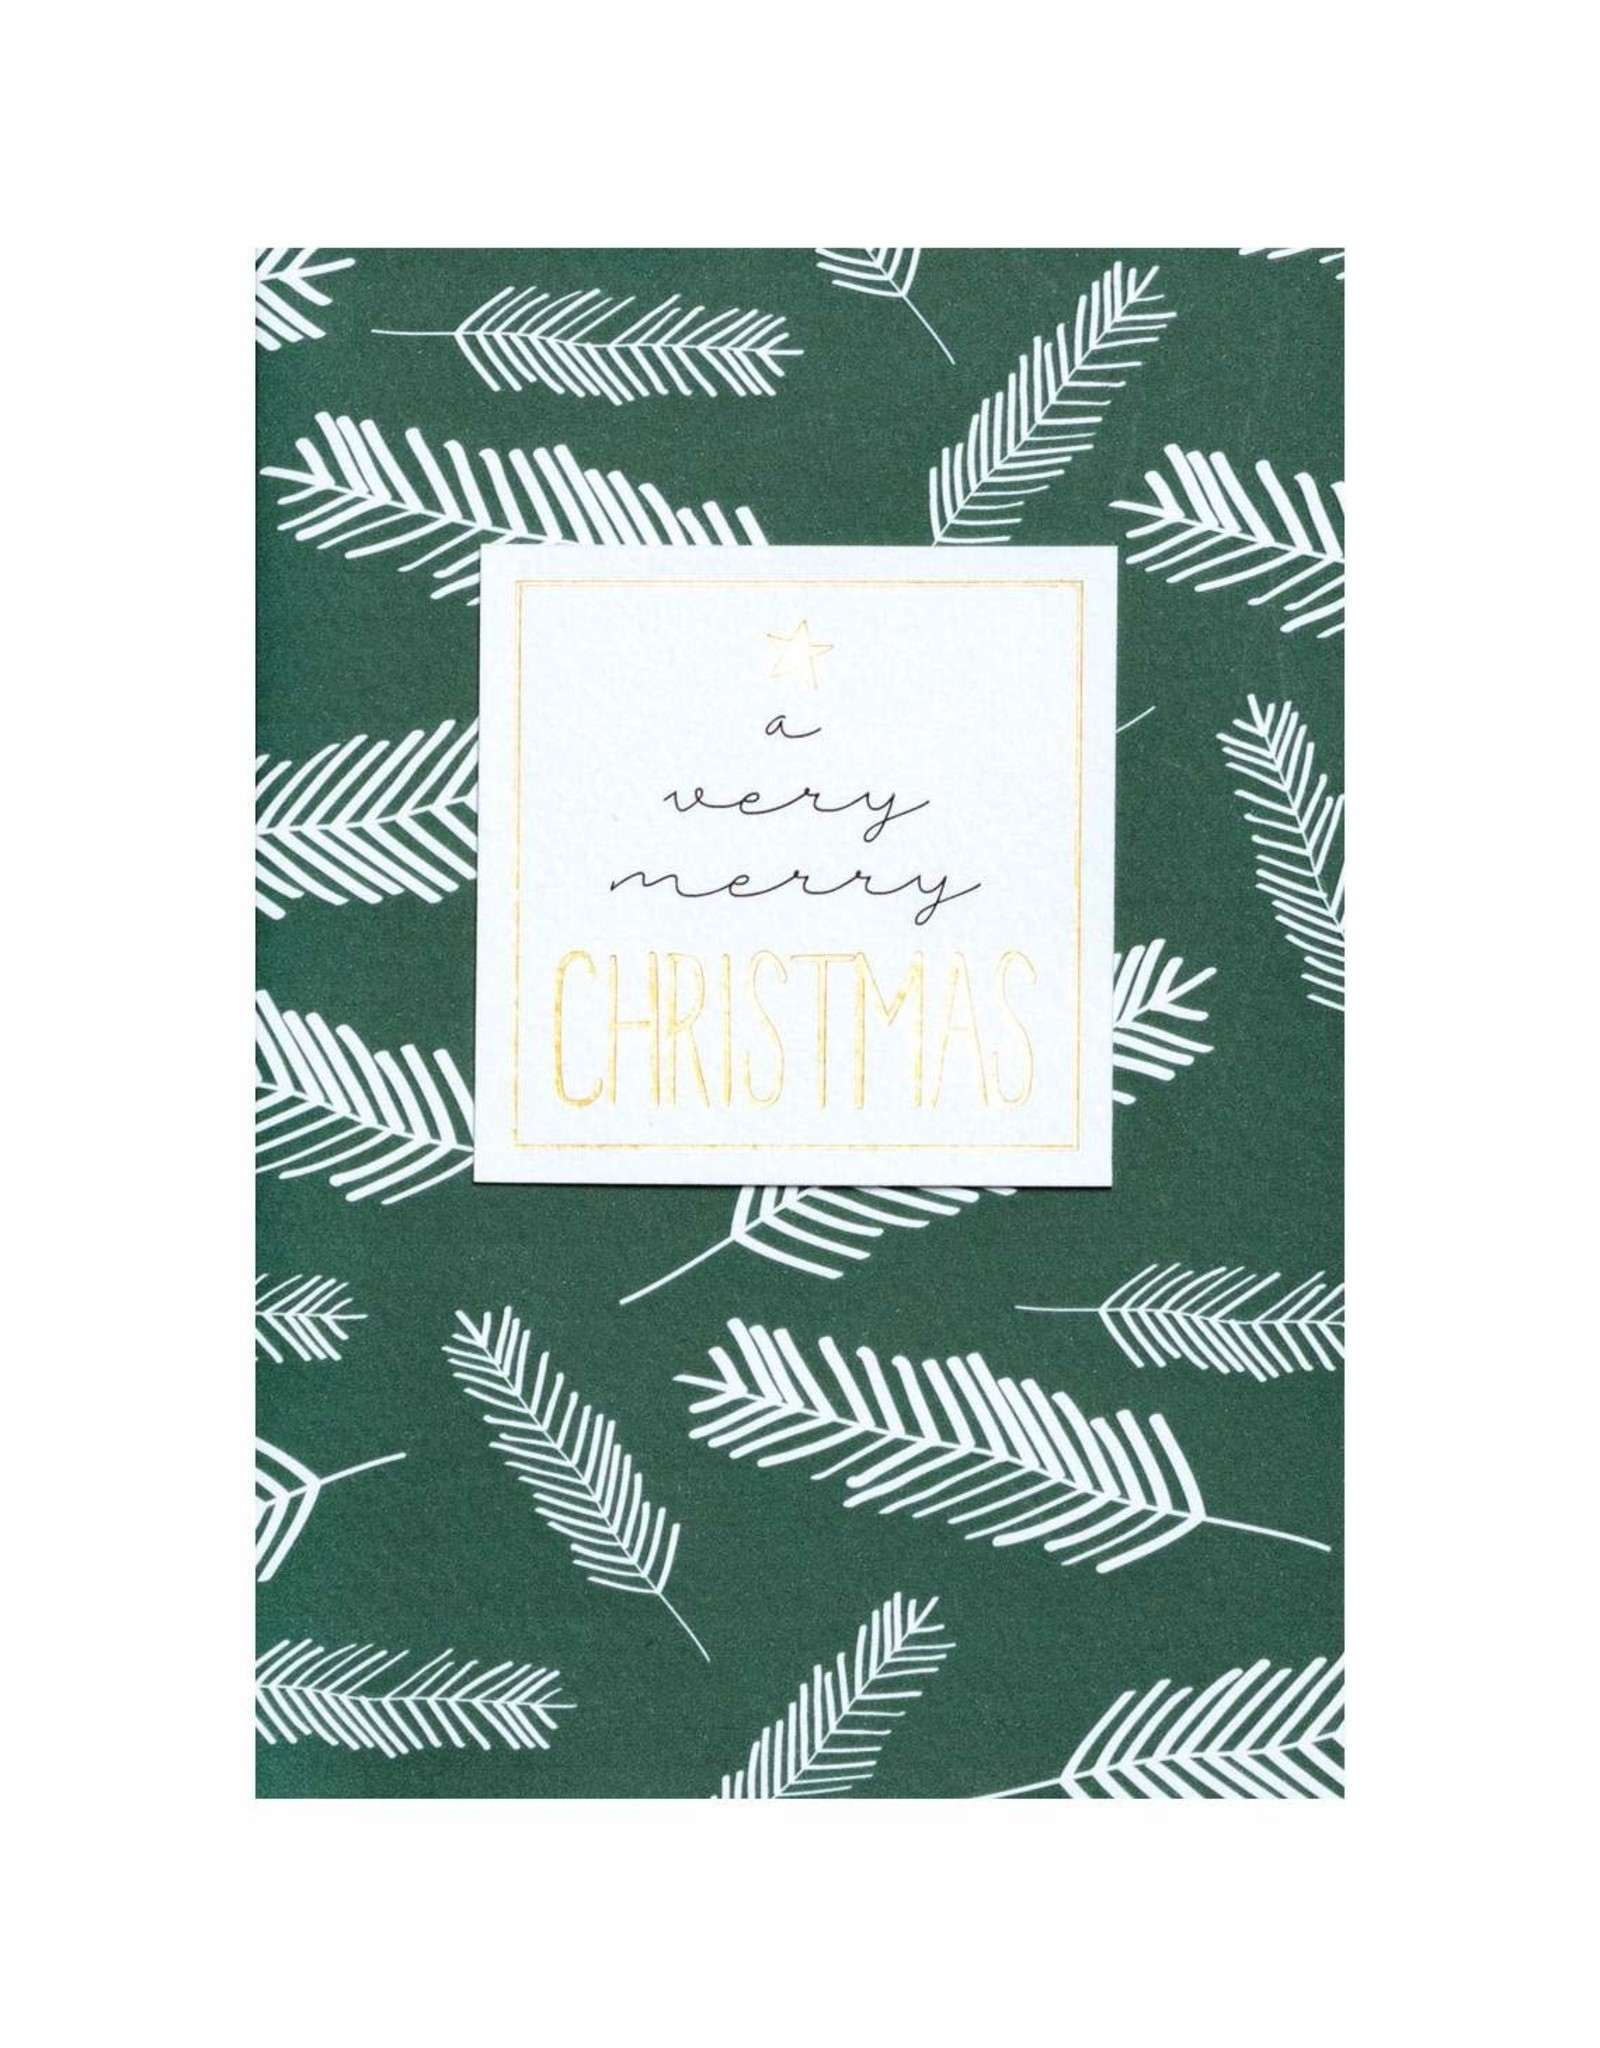 Wenskaart- Kerst - A very merry christmas -donkergroen den-dubbele kaart